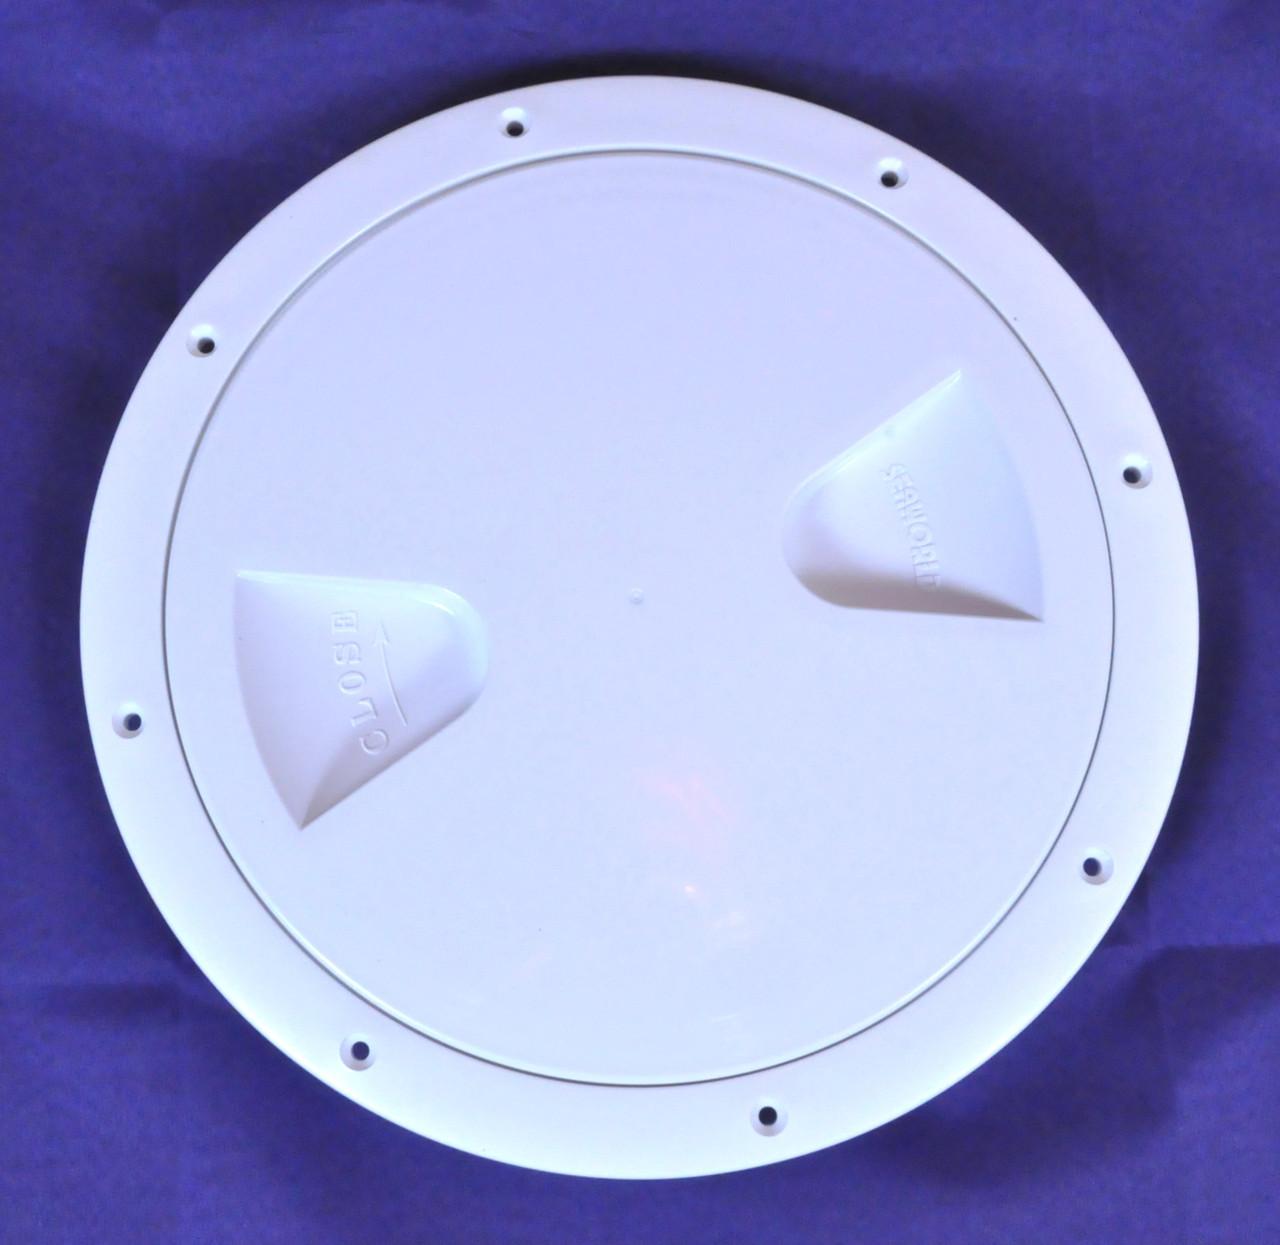 Лючок инспекция диаметр 203 мм белый, Тайвань 13563-WHR